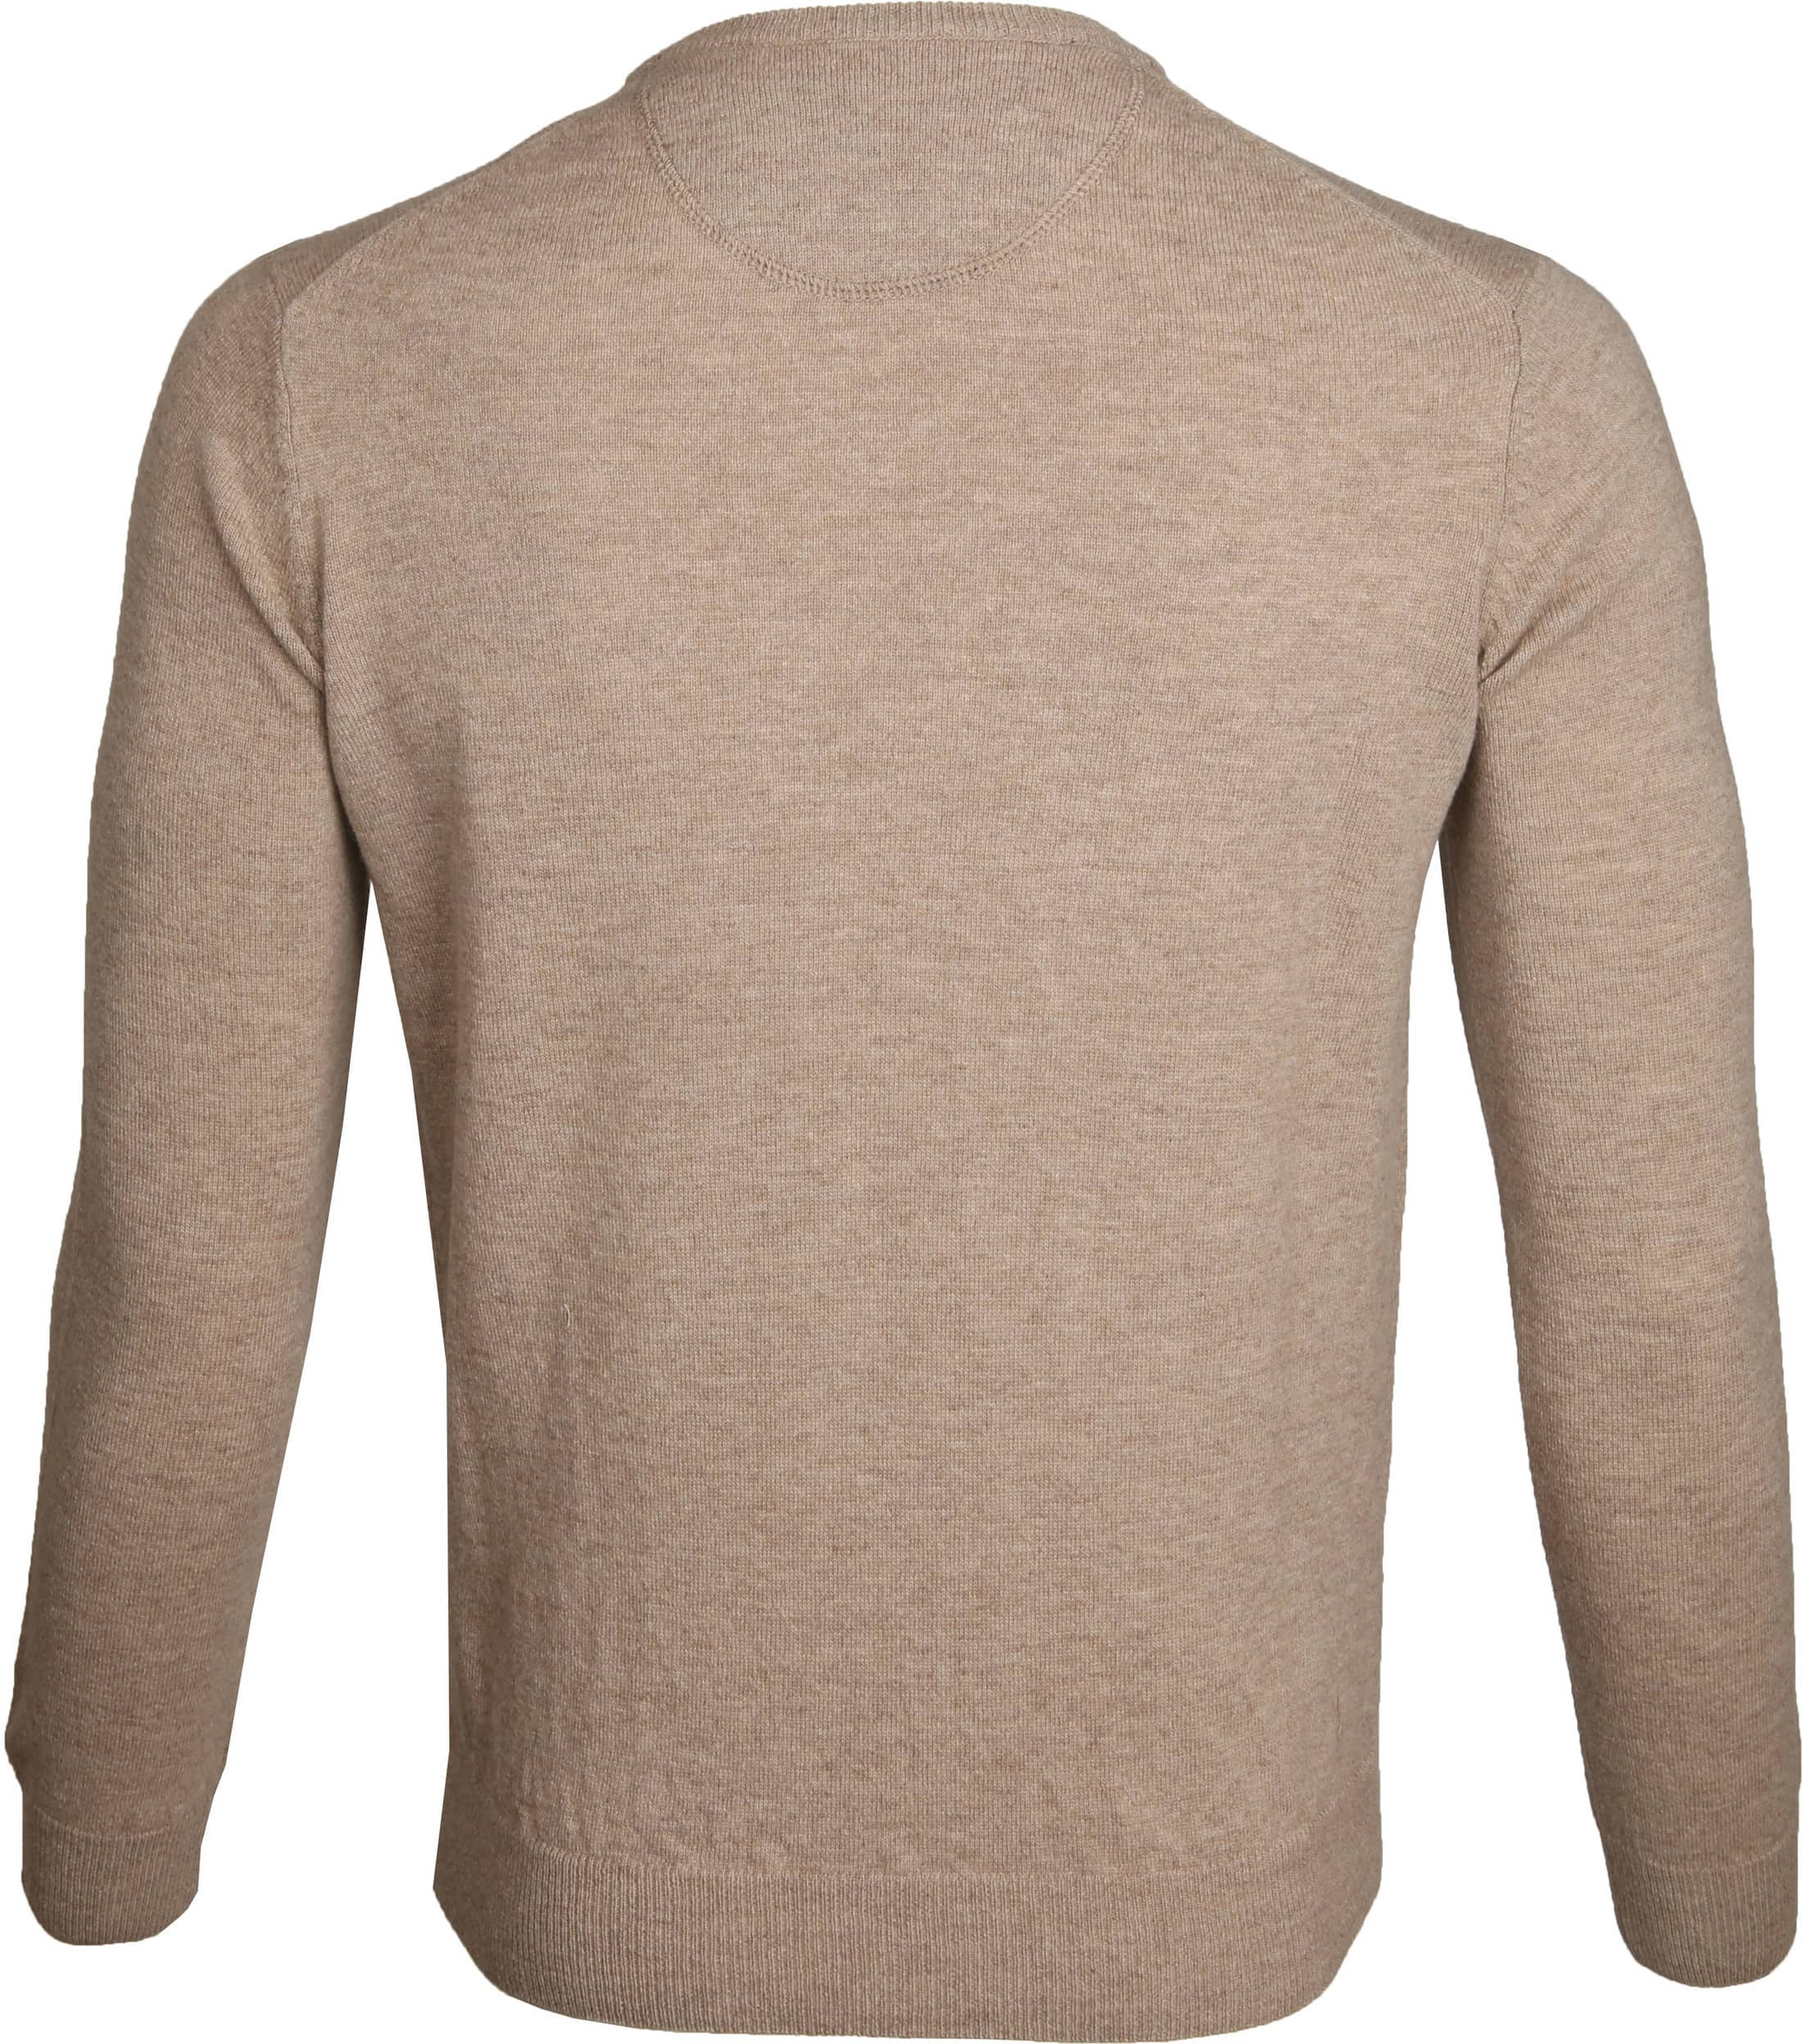 Suitable Pullover Lammwolle V-Ausschnitt Beige foto 2